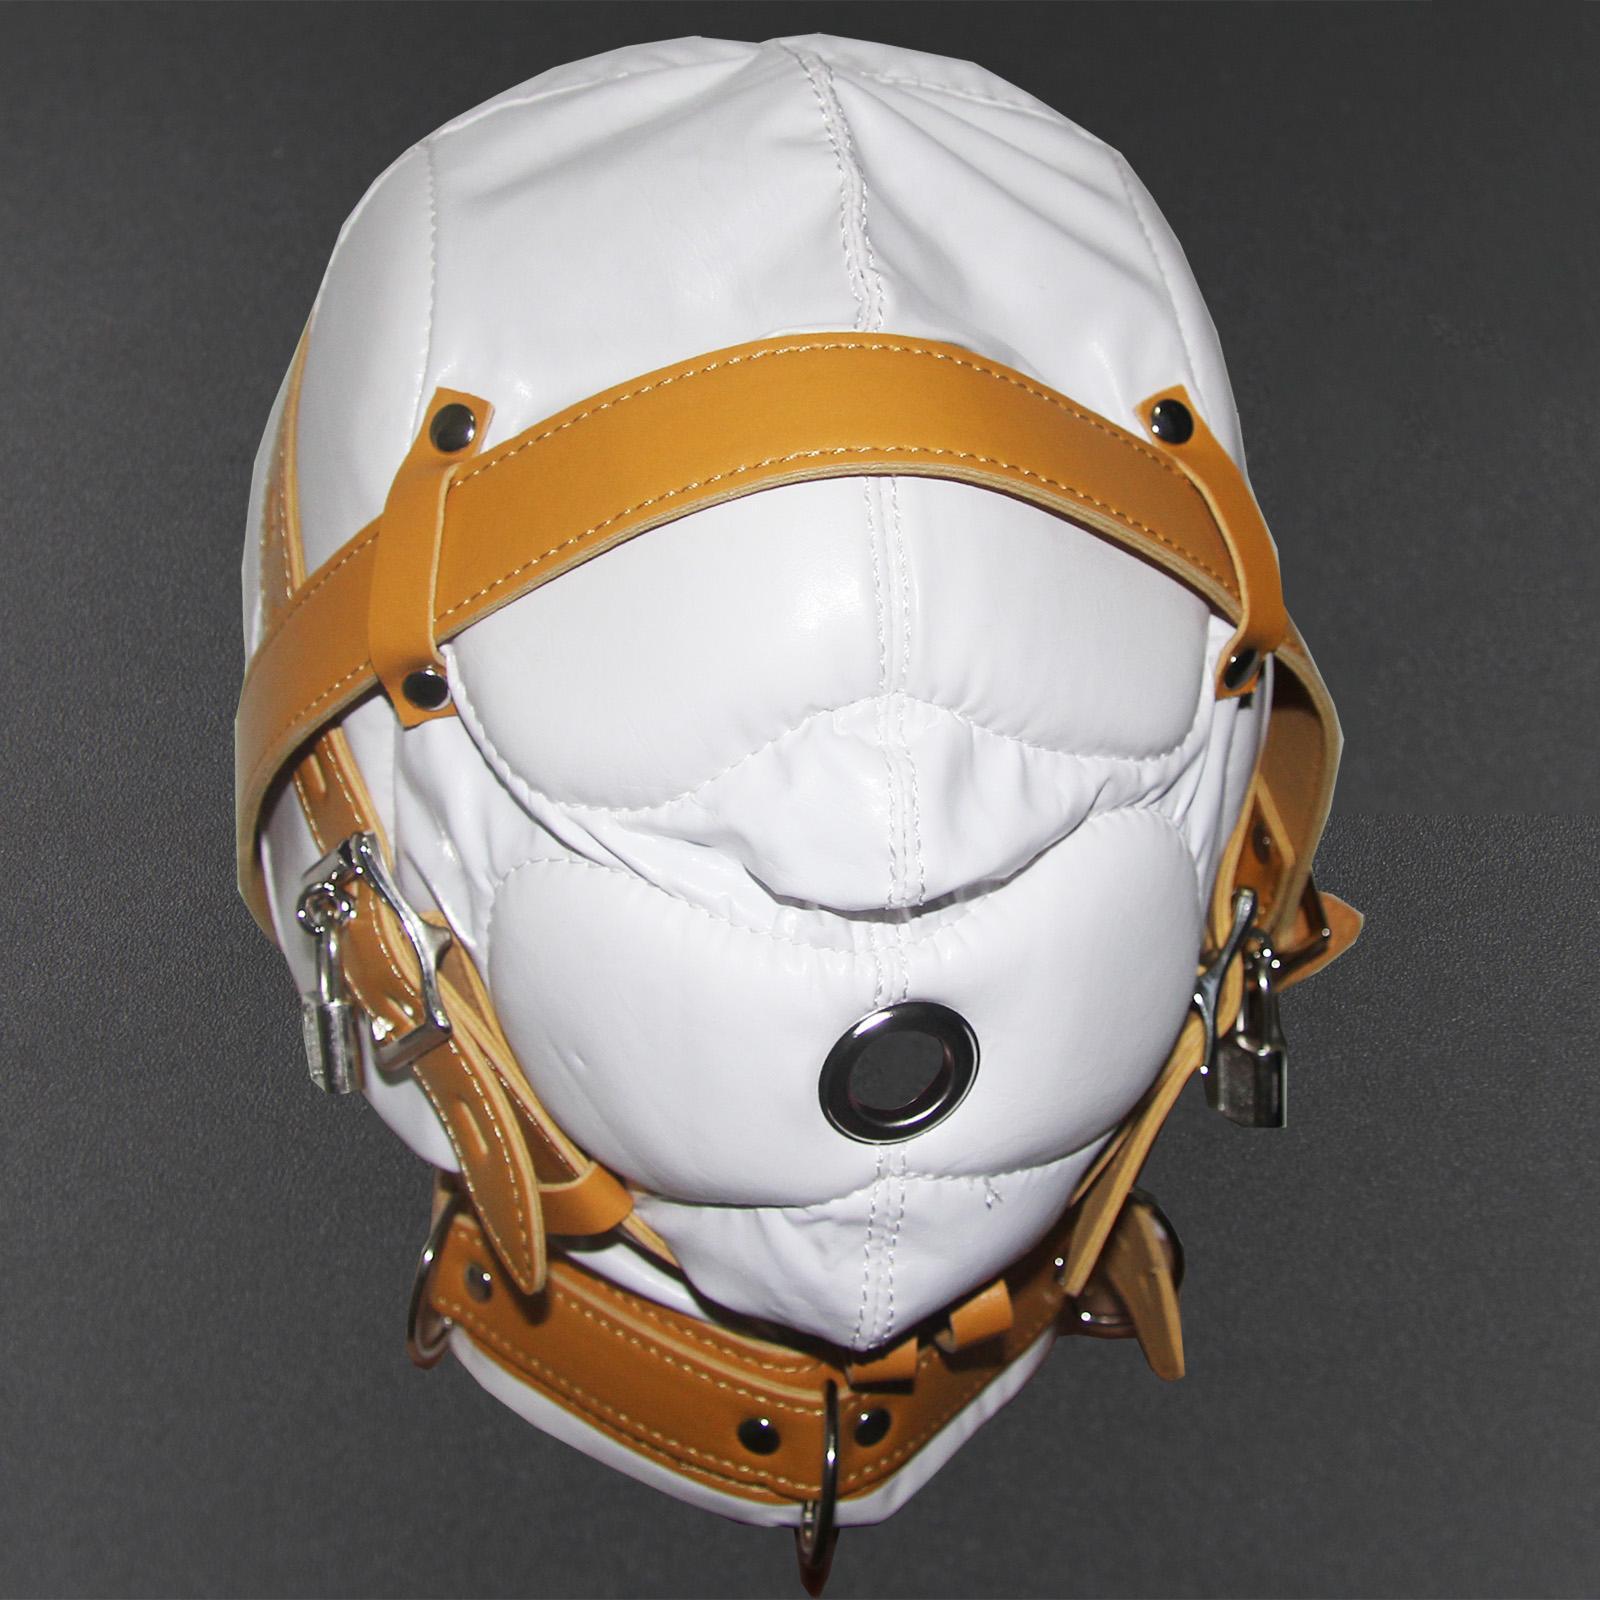 Insgesamt Sensorische Deprivation Hood-Maske-Qualitäts-PVC-Leder Slave Kopfharness Restraint